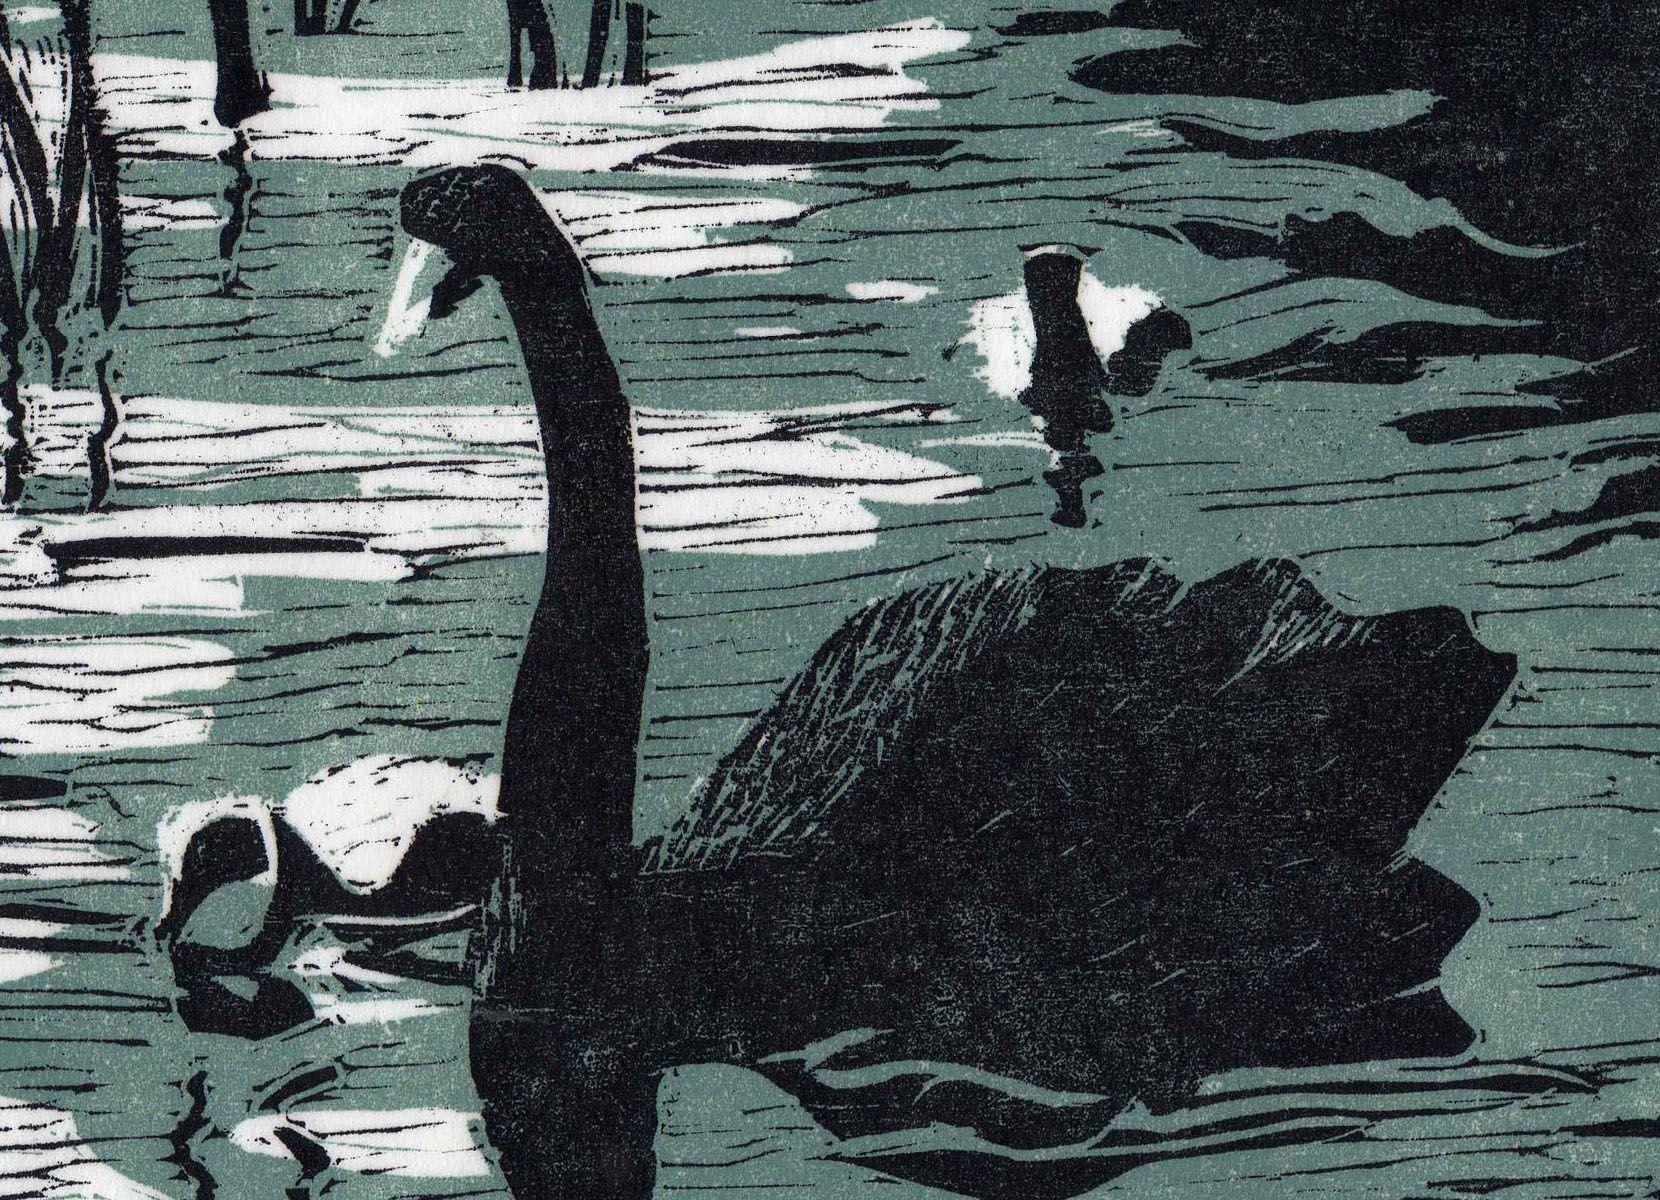 woodcut print of a swan